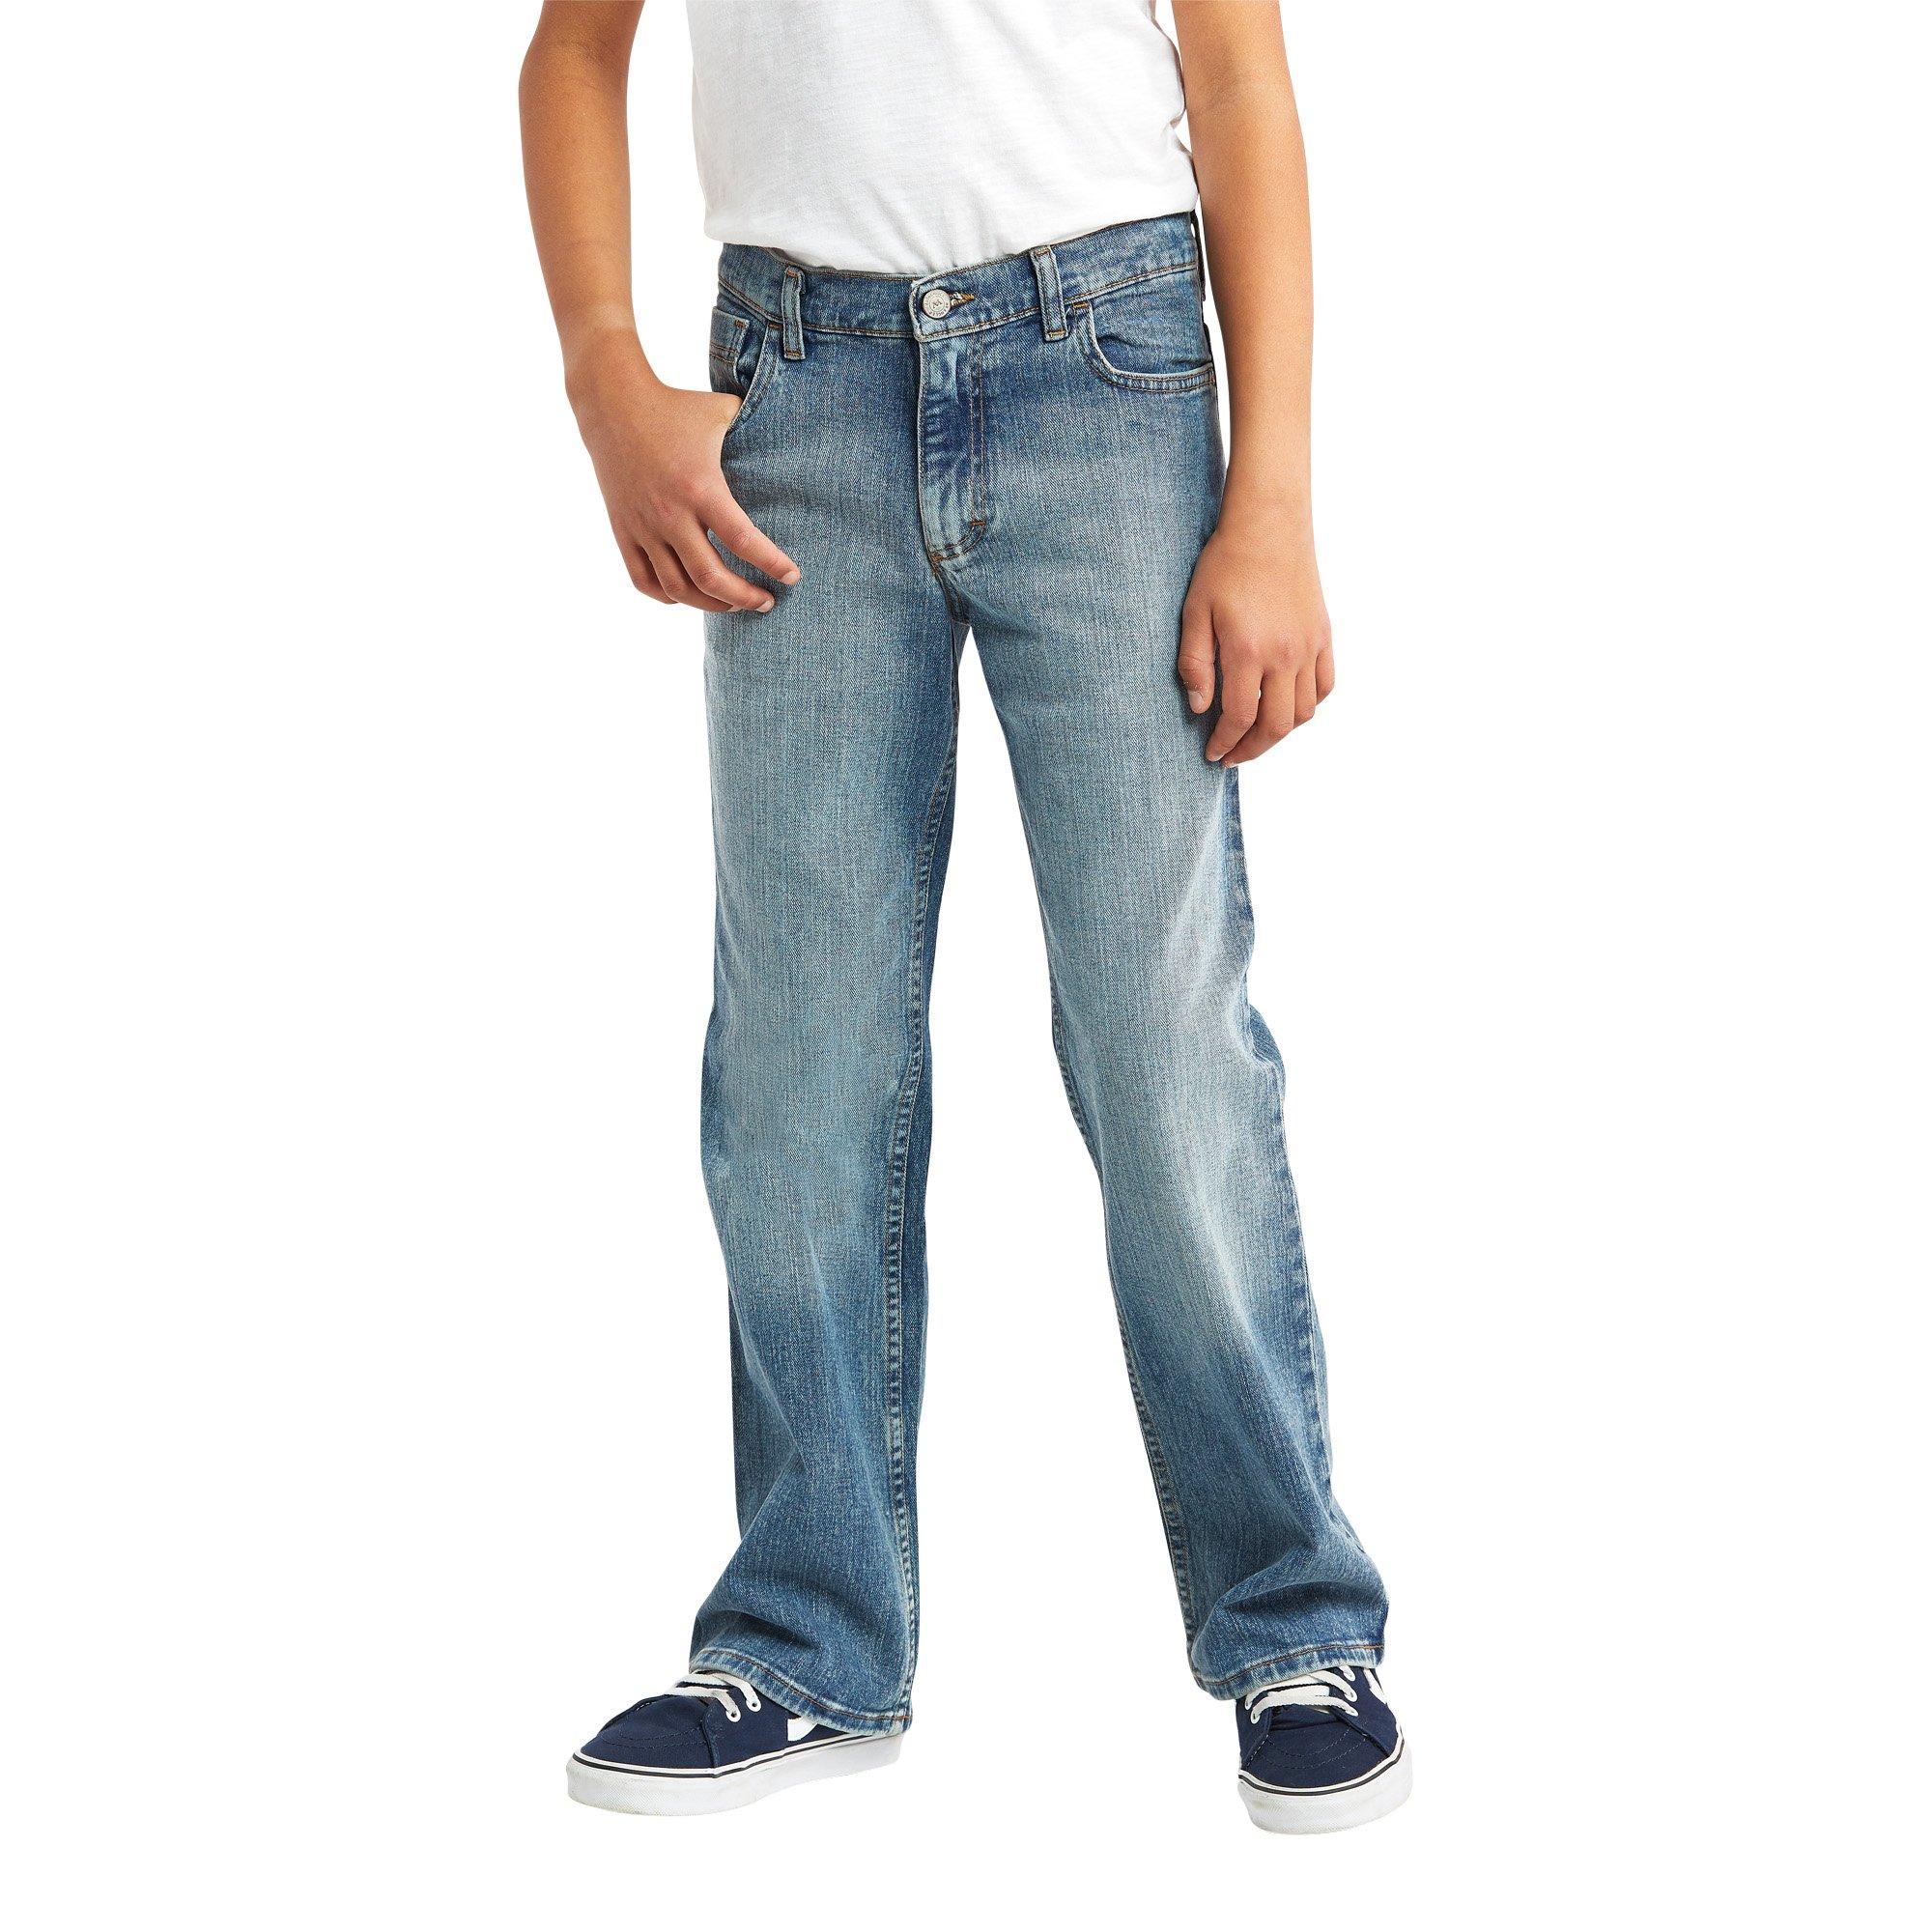 Wrangler Authentics Big Boys' Boot Cut Jeans, Stonewash Indigo, 12